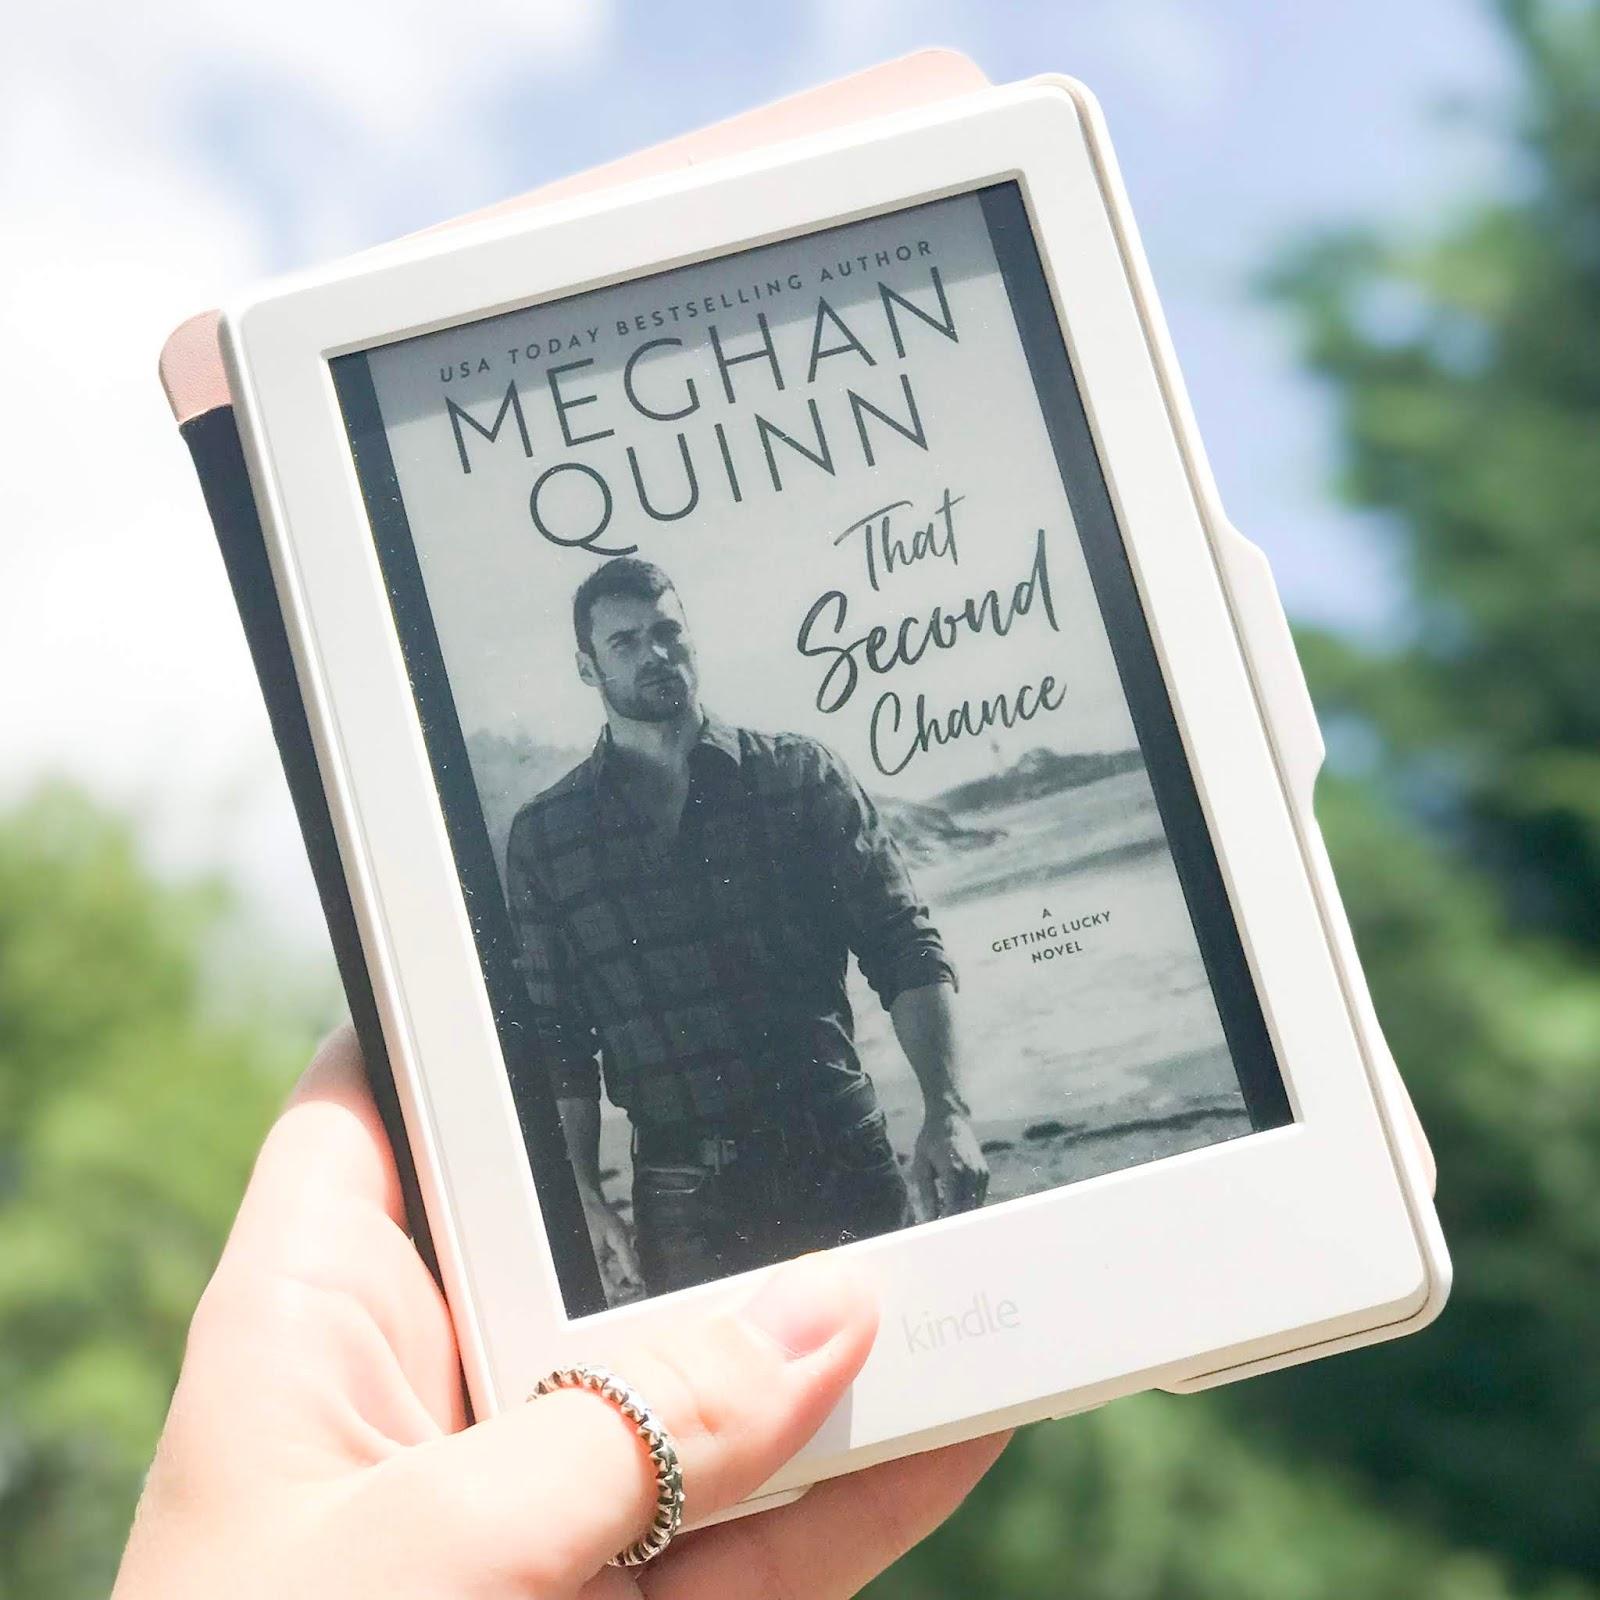 That Second Chance - Meghan Quinn